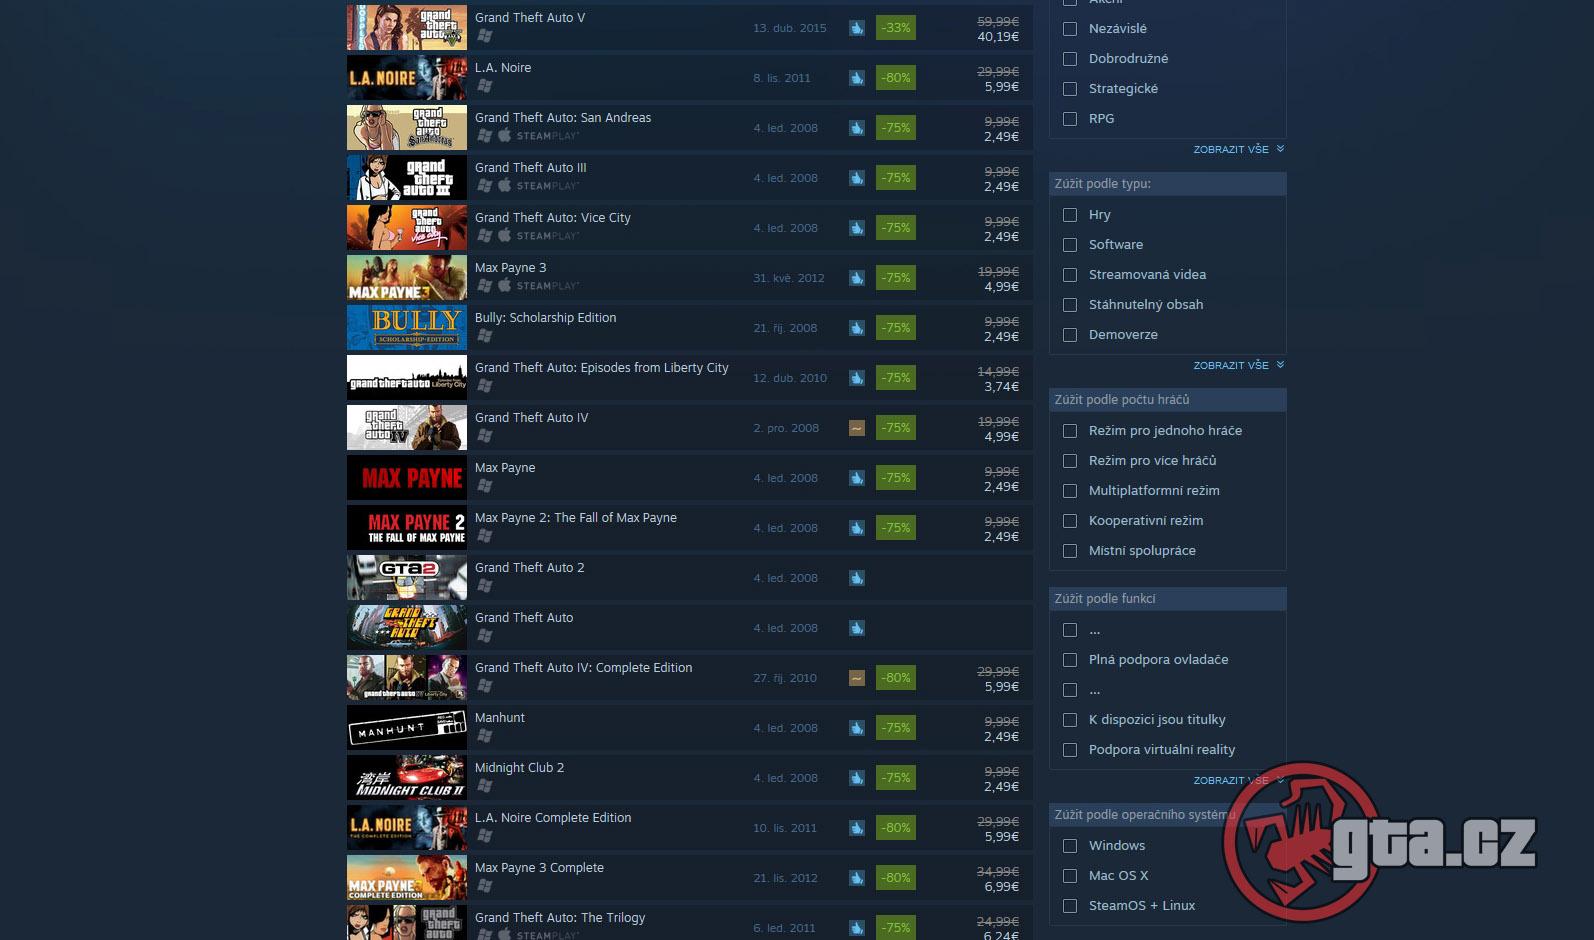 Gta 5 rockstar vs steam | Buy Grand Theft Auto V Rockstar